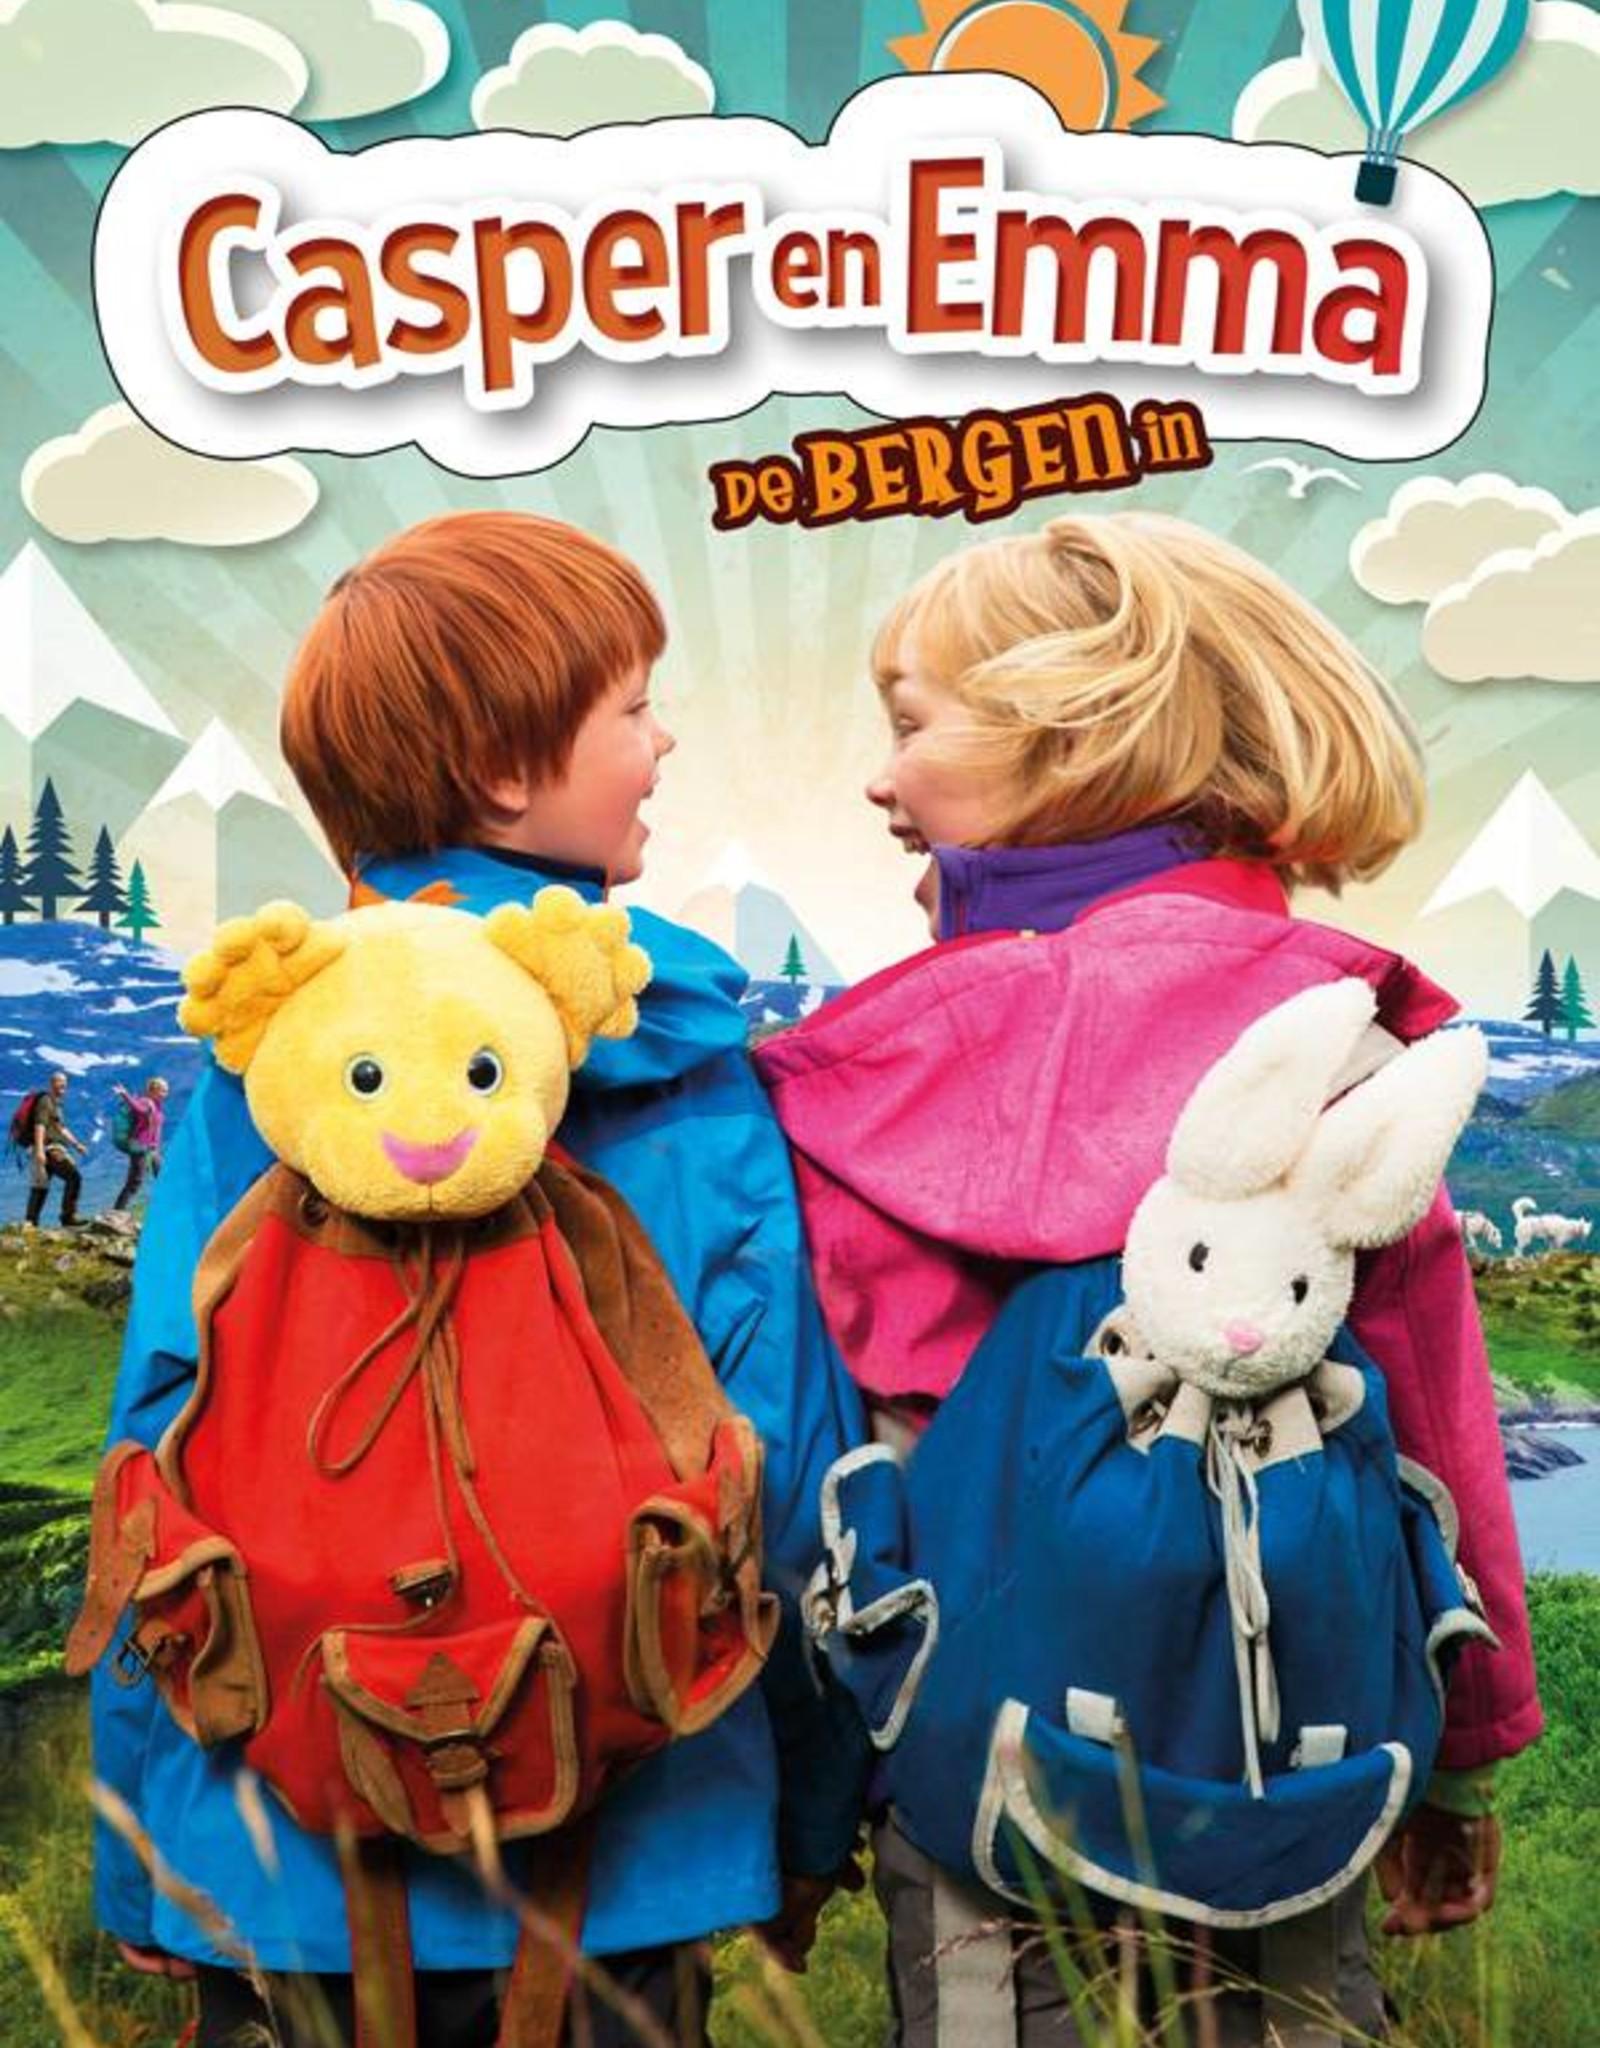 Just Entertainment Casper en Emma - De bergen in